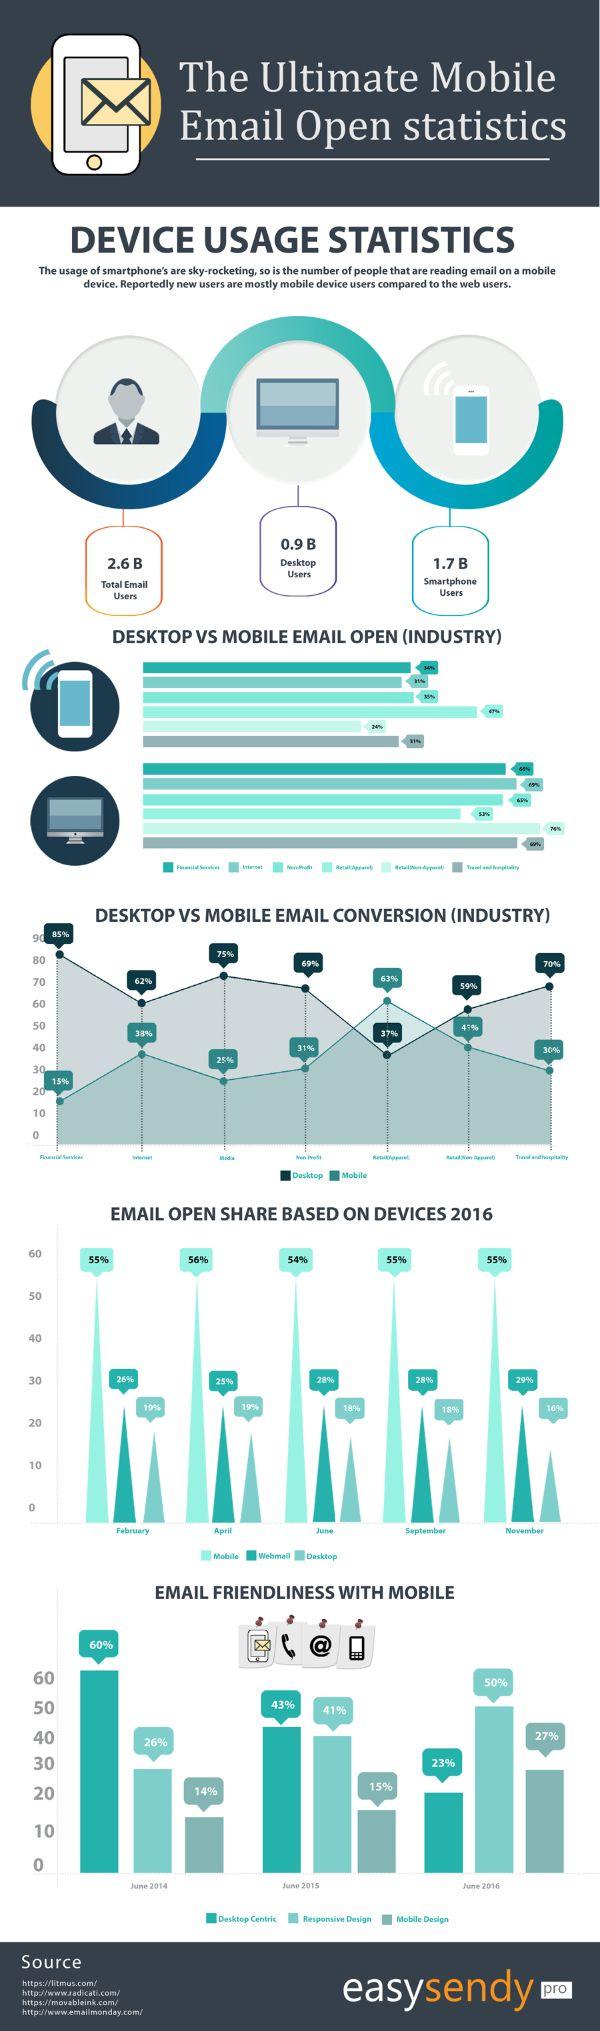 89 best Email Marketing images on Pinterest | Digital marketing ...